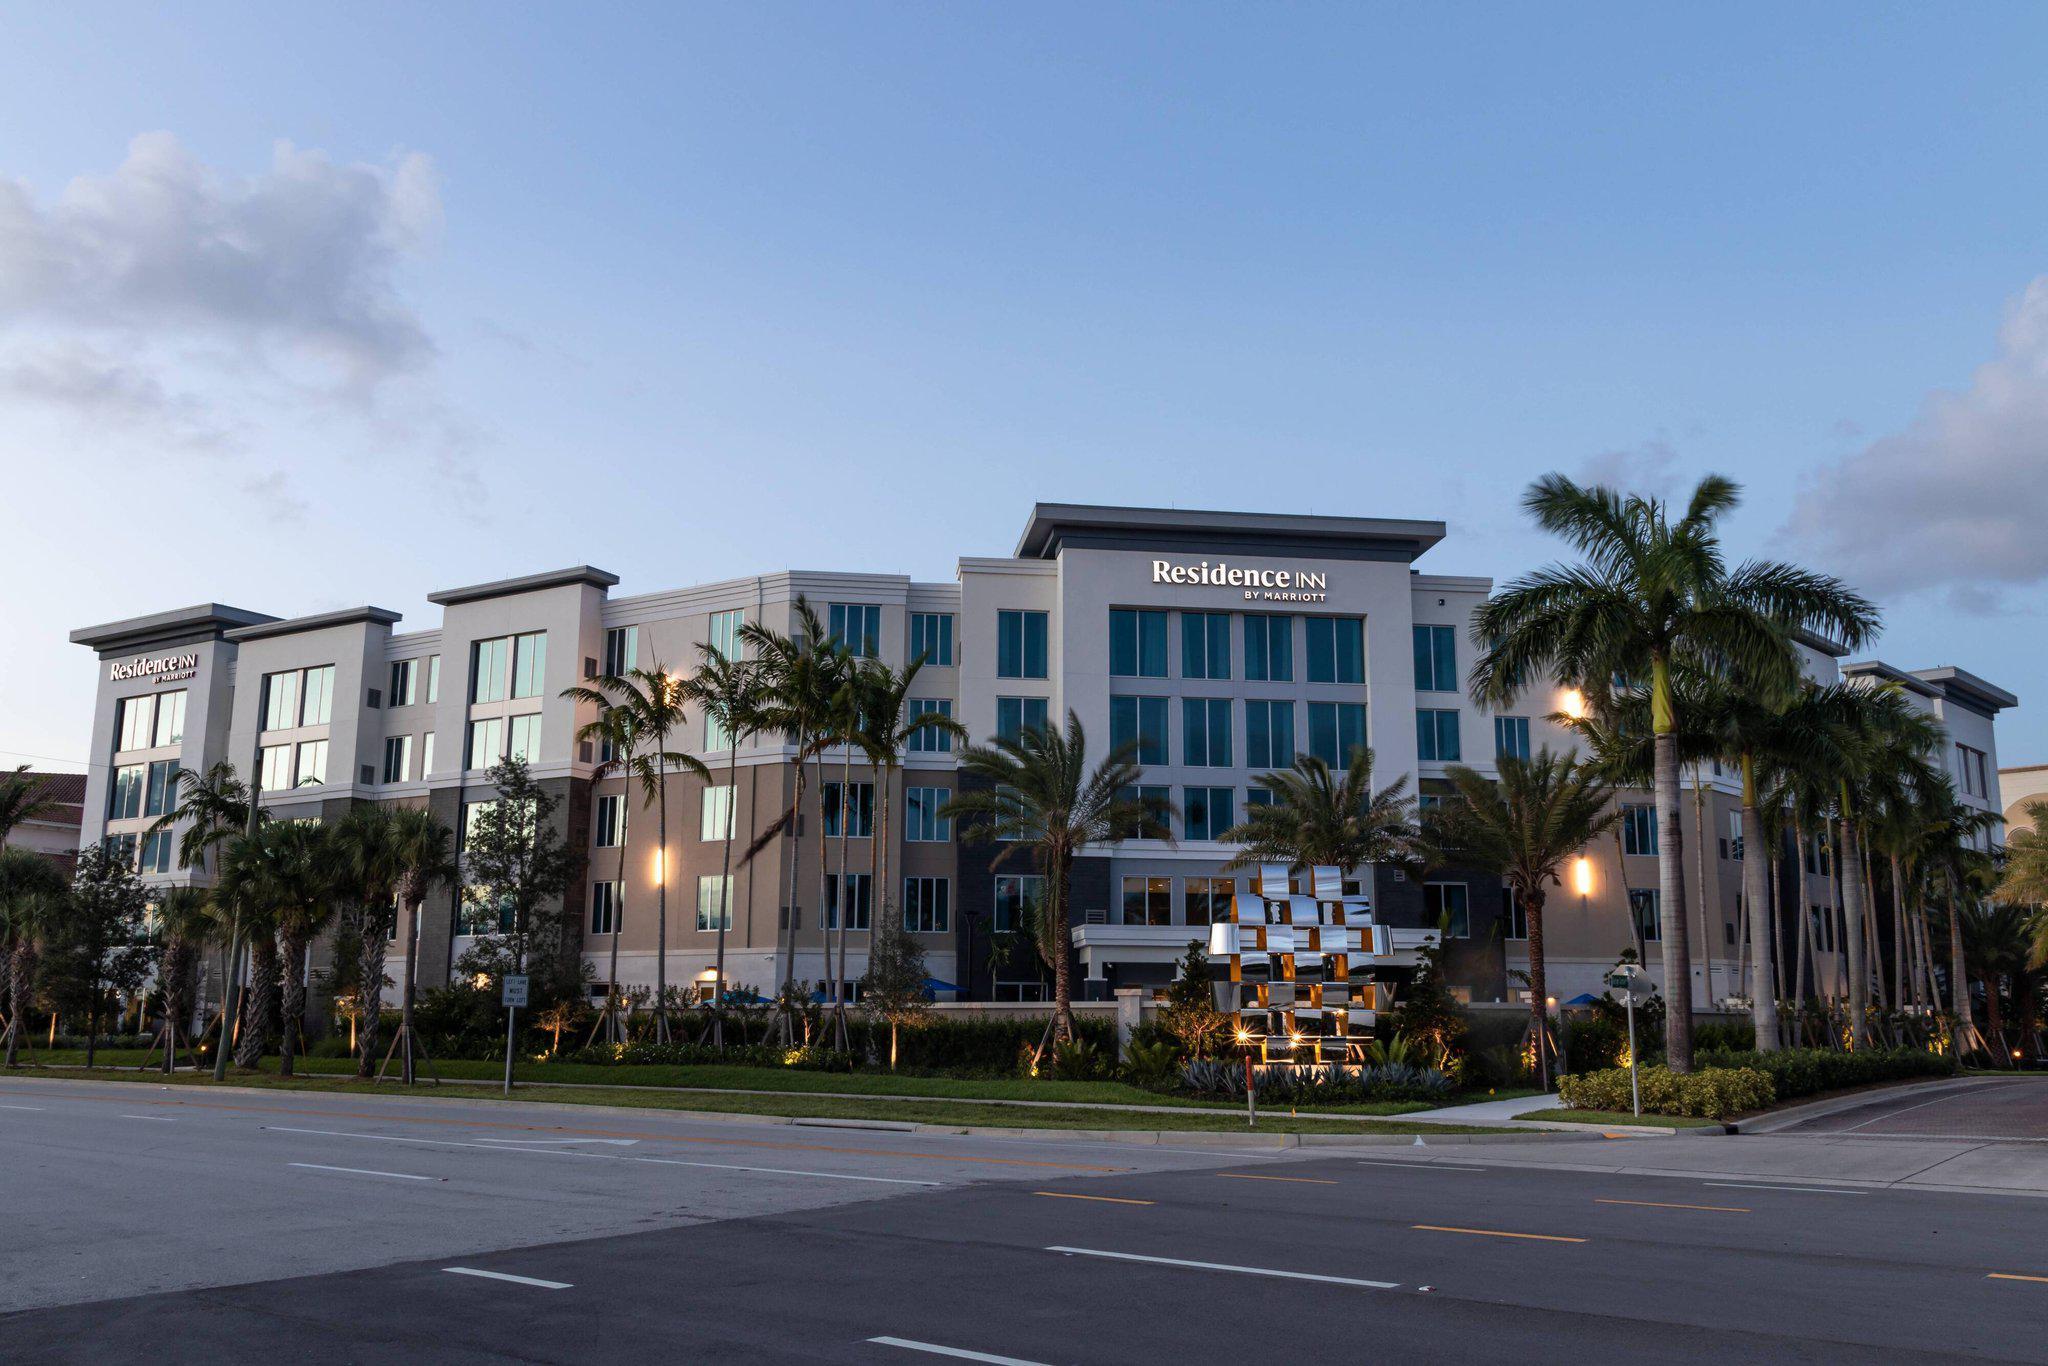 Residence Inn by Marriott Palm Beach Gardens